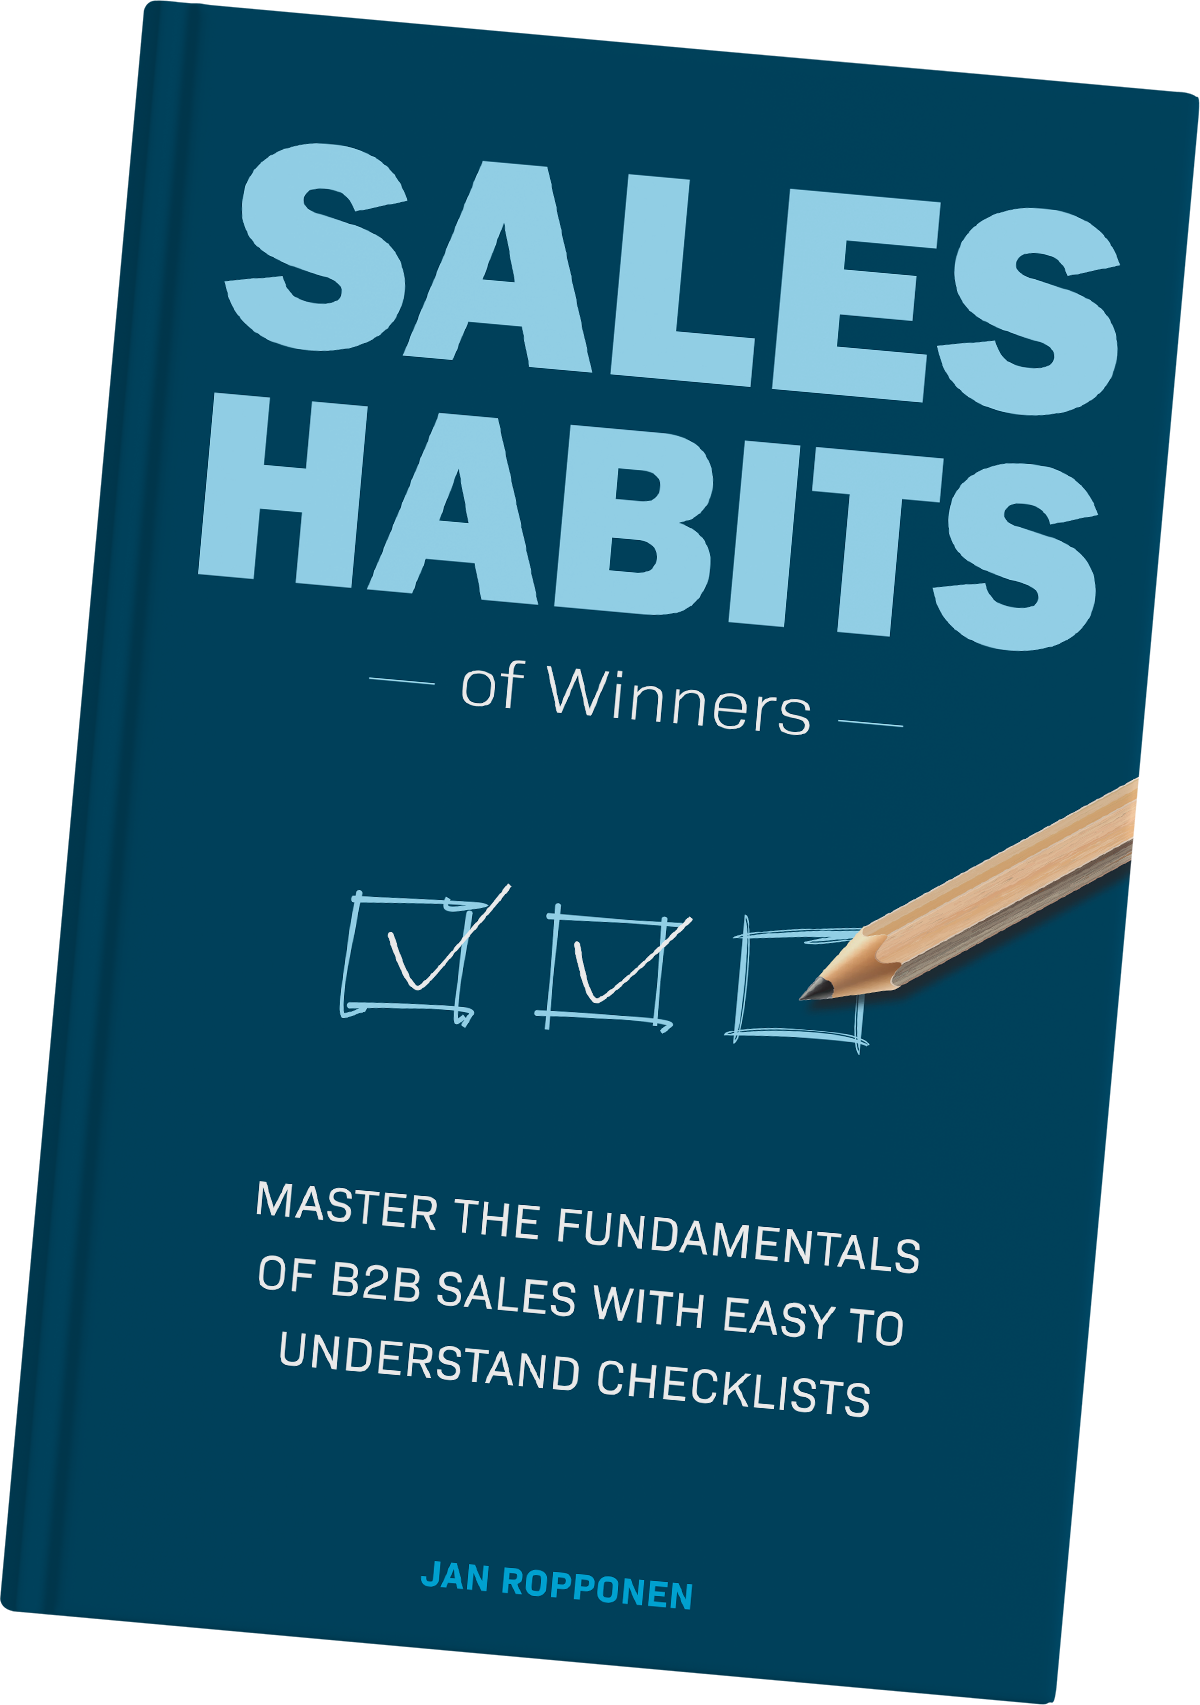 Sales-habits-of-winners-kansi.png